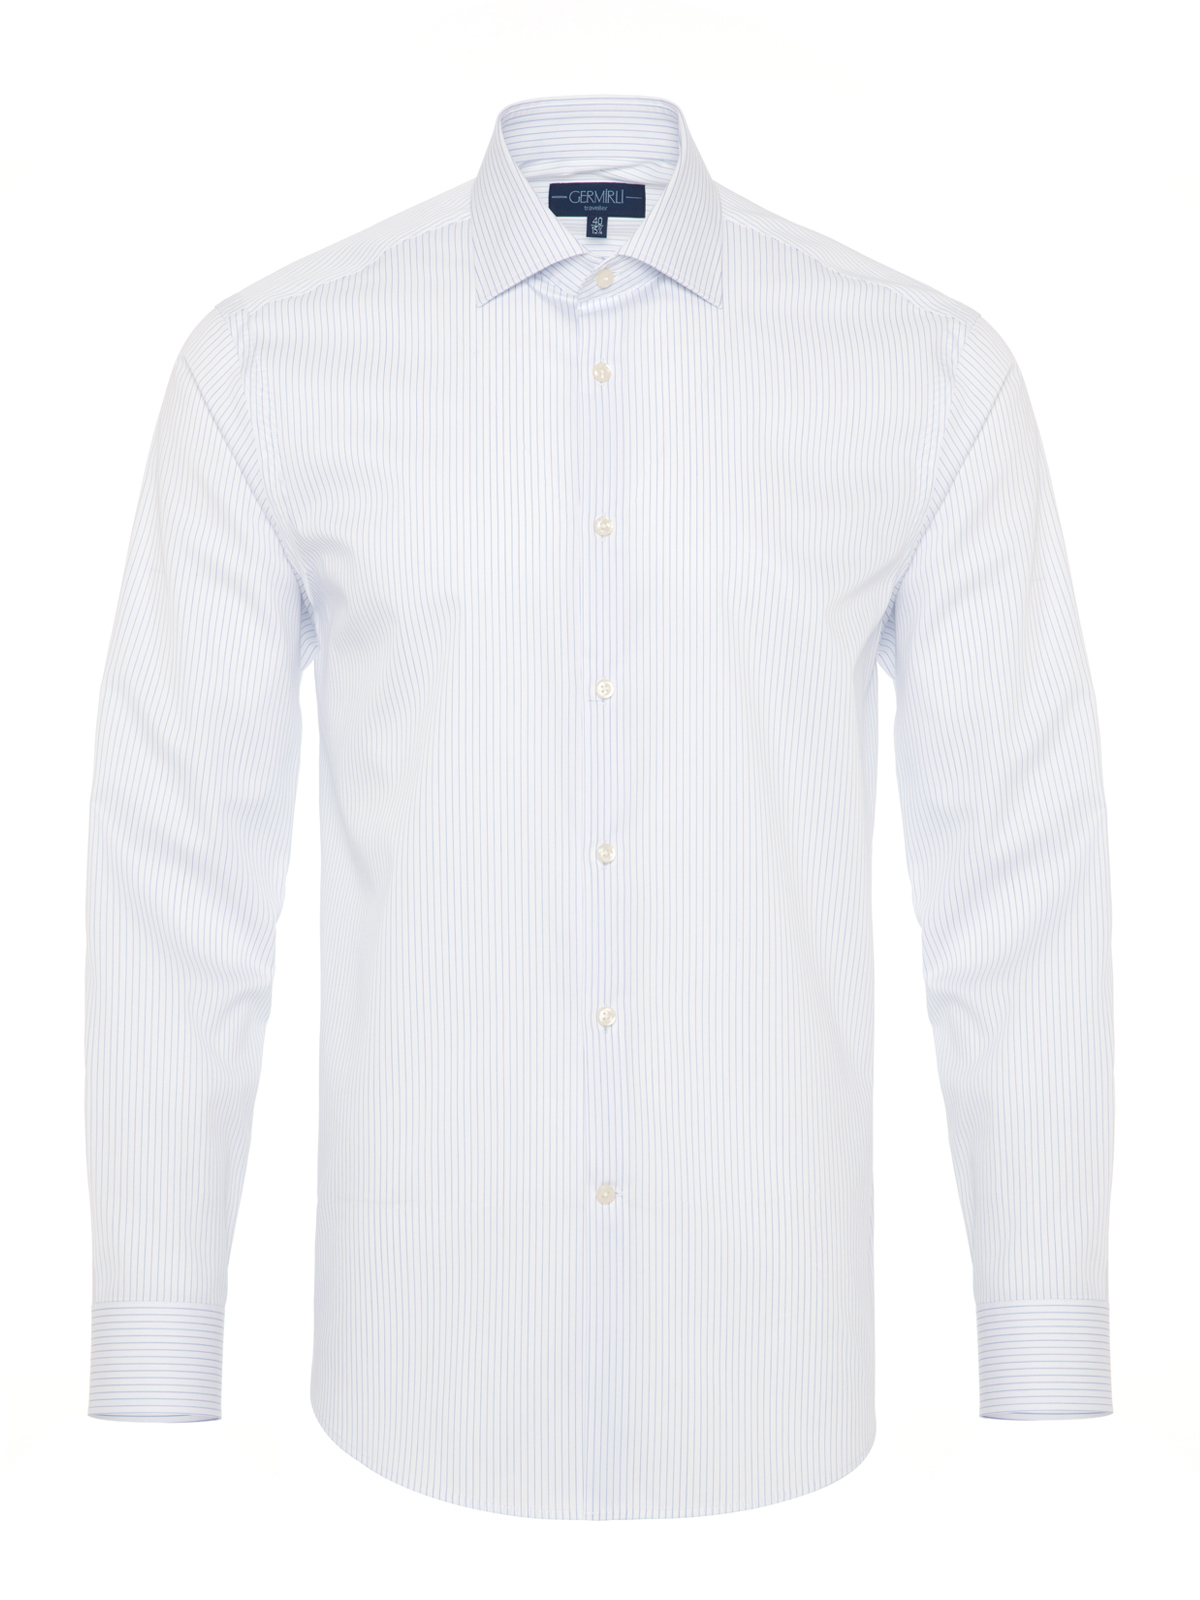 Germirli Non Iron Lacivert Çizgili Klasik Yaka Tailor Fit Gömlek